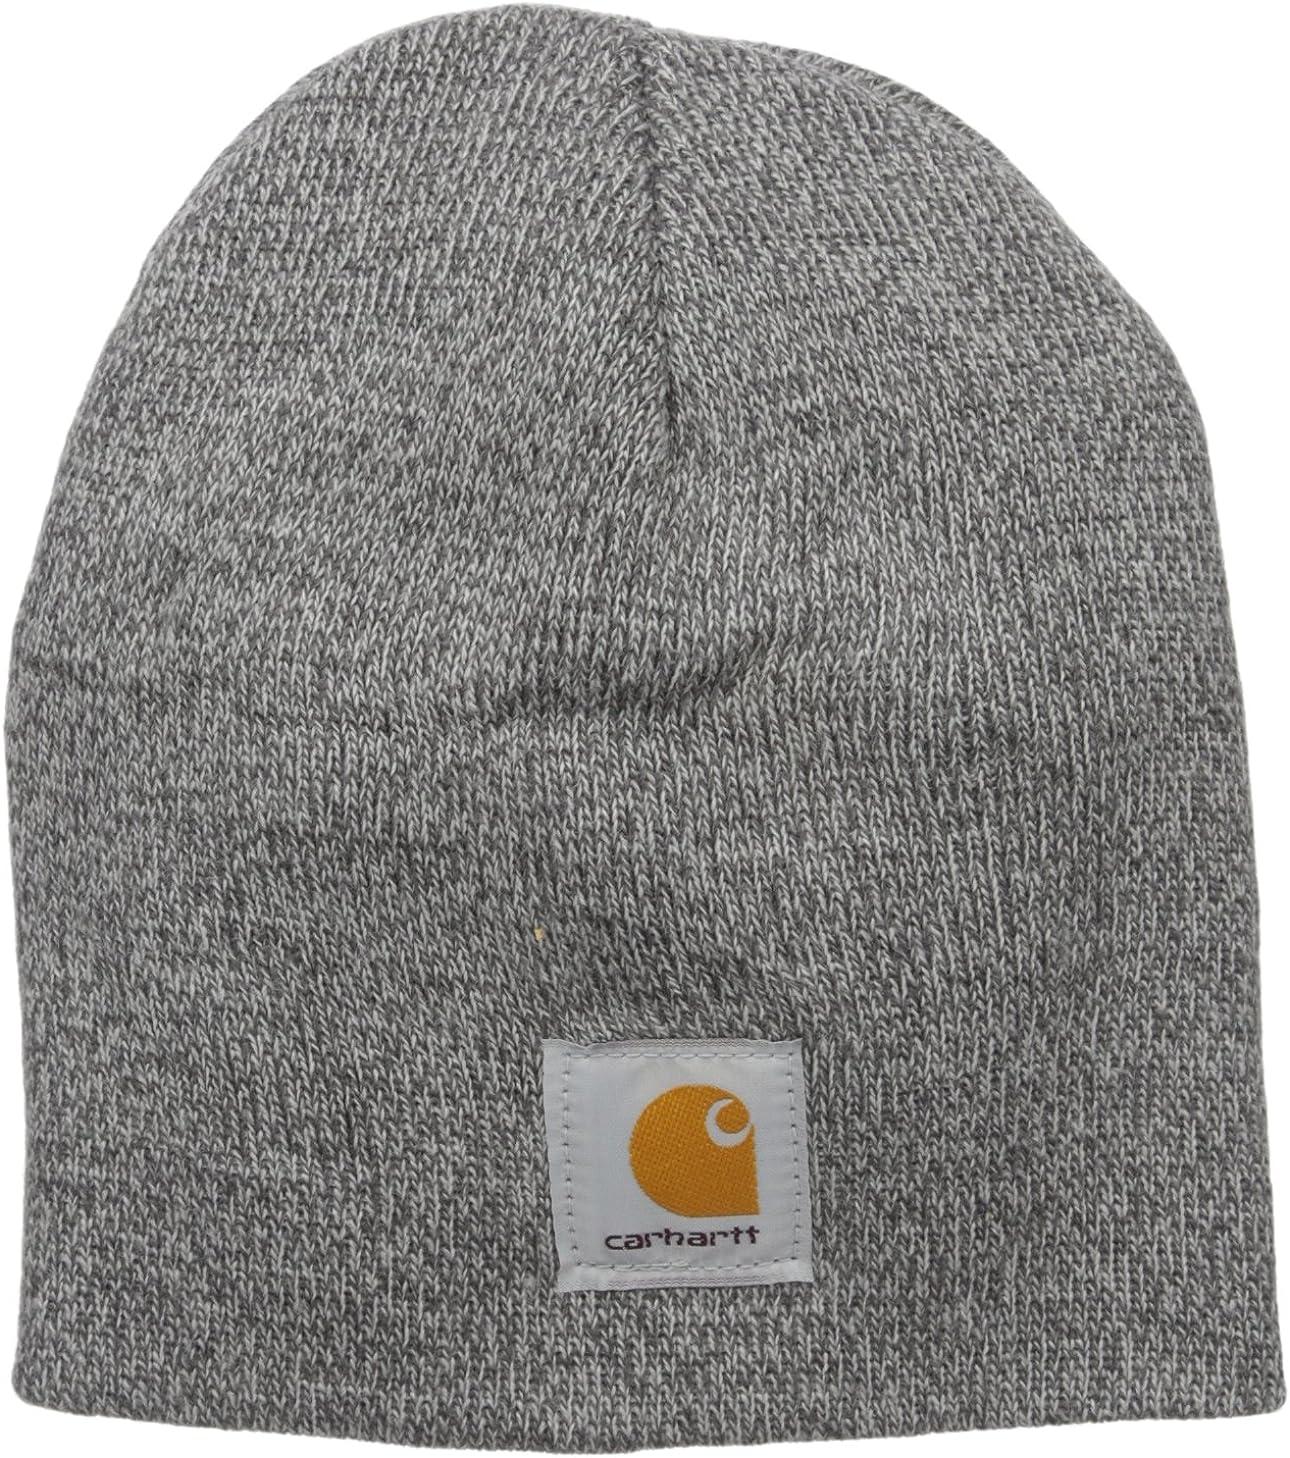 Carhartt Mens Acrylic Knit Hat